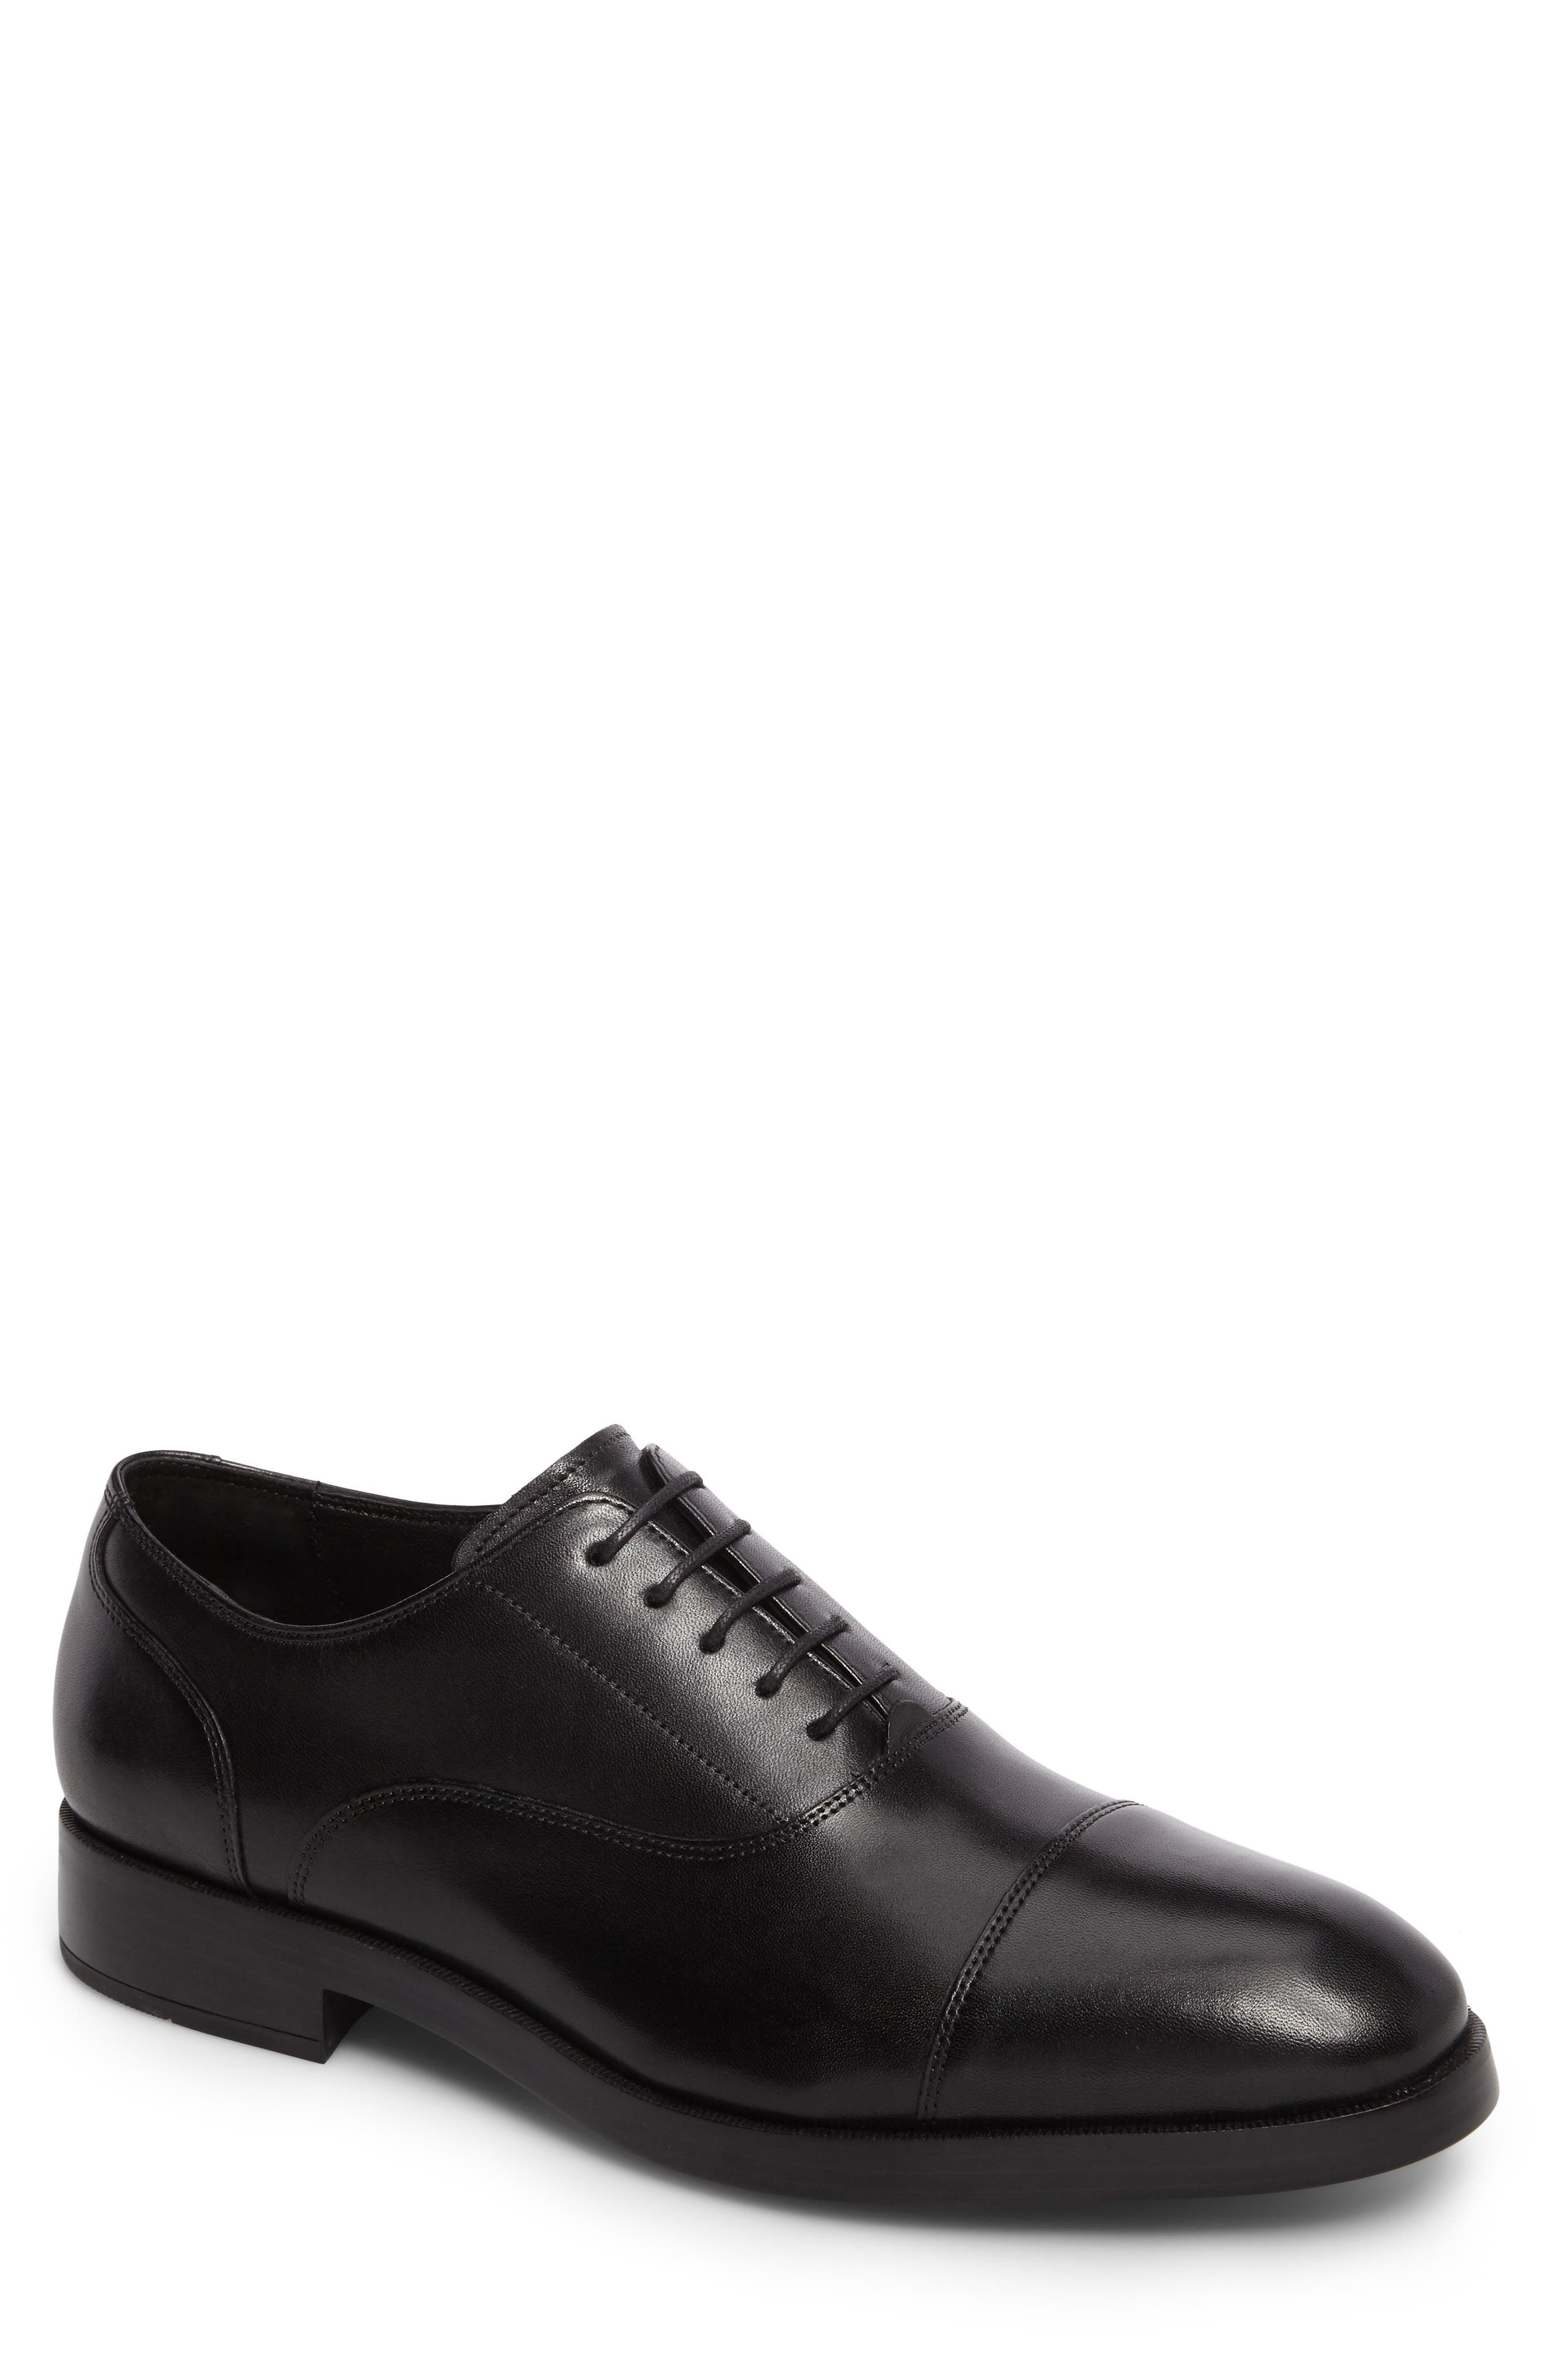 Harrison Grand Cap Toe Oxford, Main, color, BLACK/ BLACK LEATHER